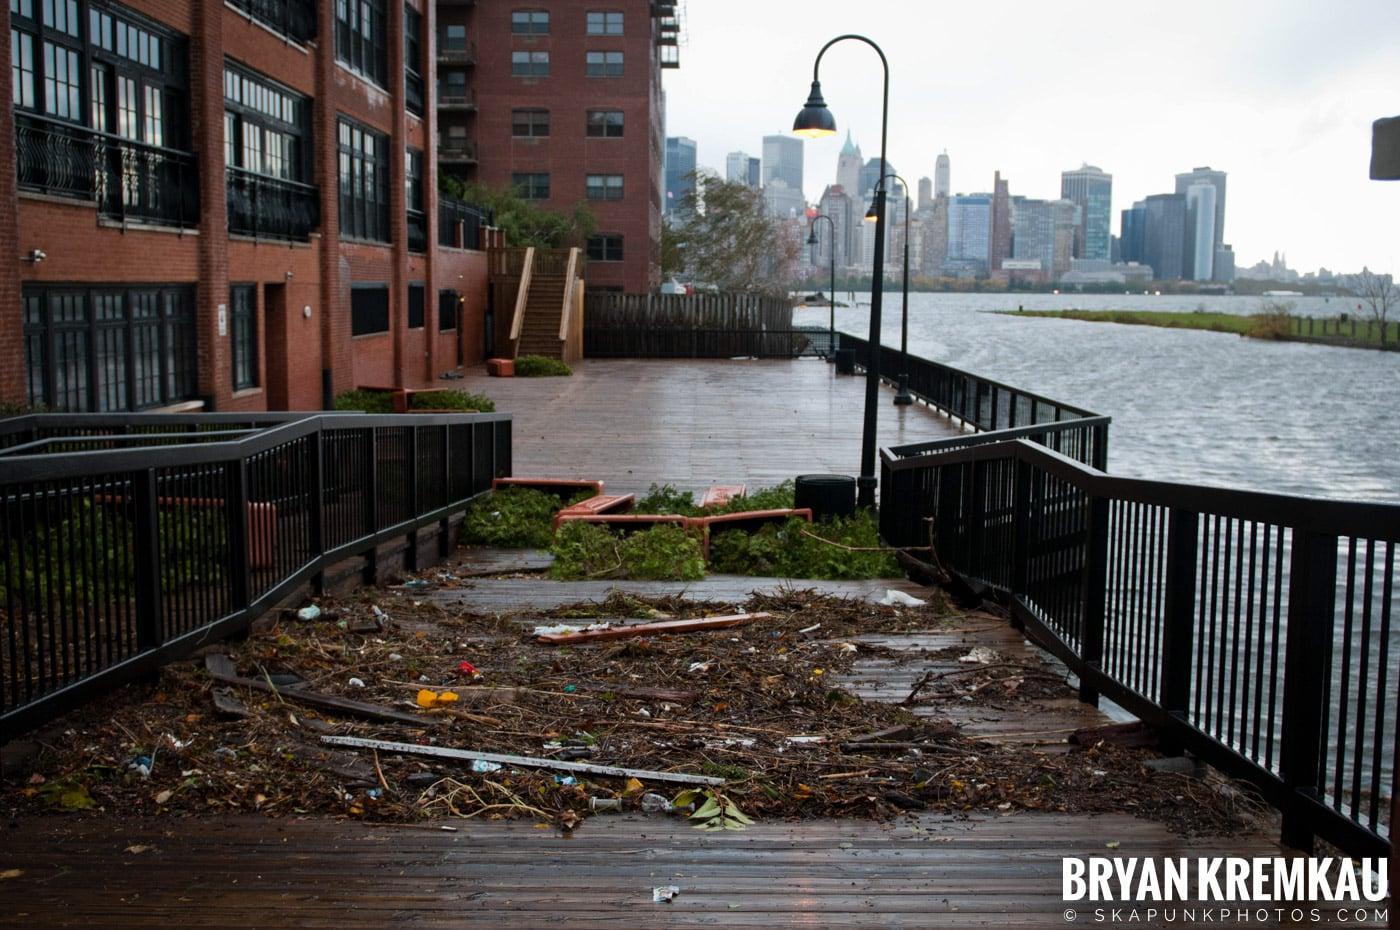 Hurricane Sandy 2012 @ Paulus Hook, Jersey City - 10.29.12 - 10.30.12 (39)